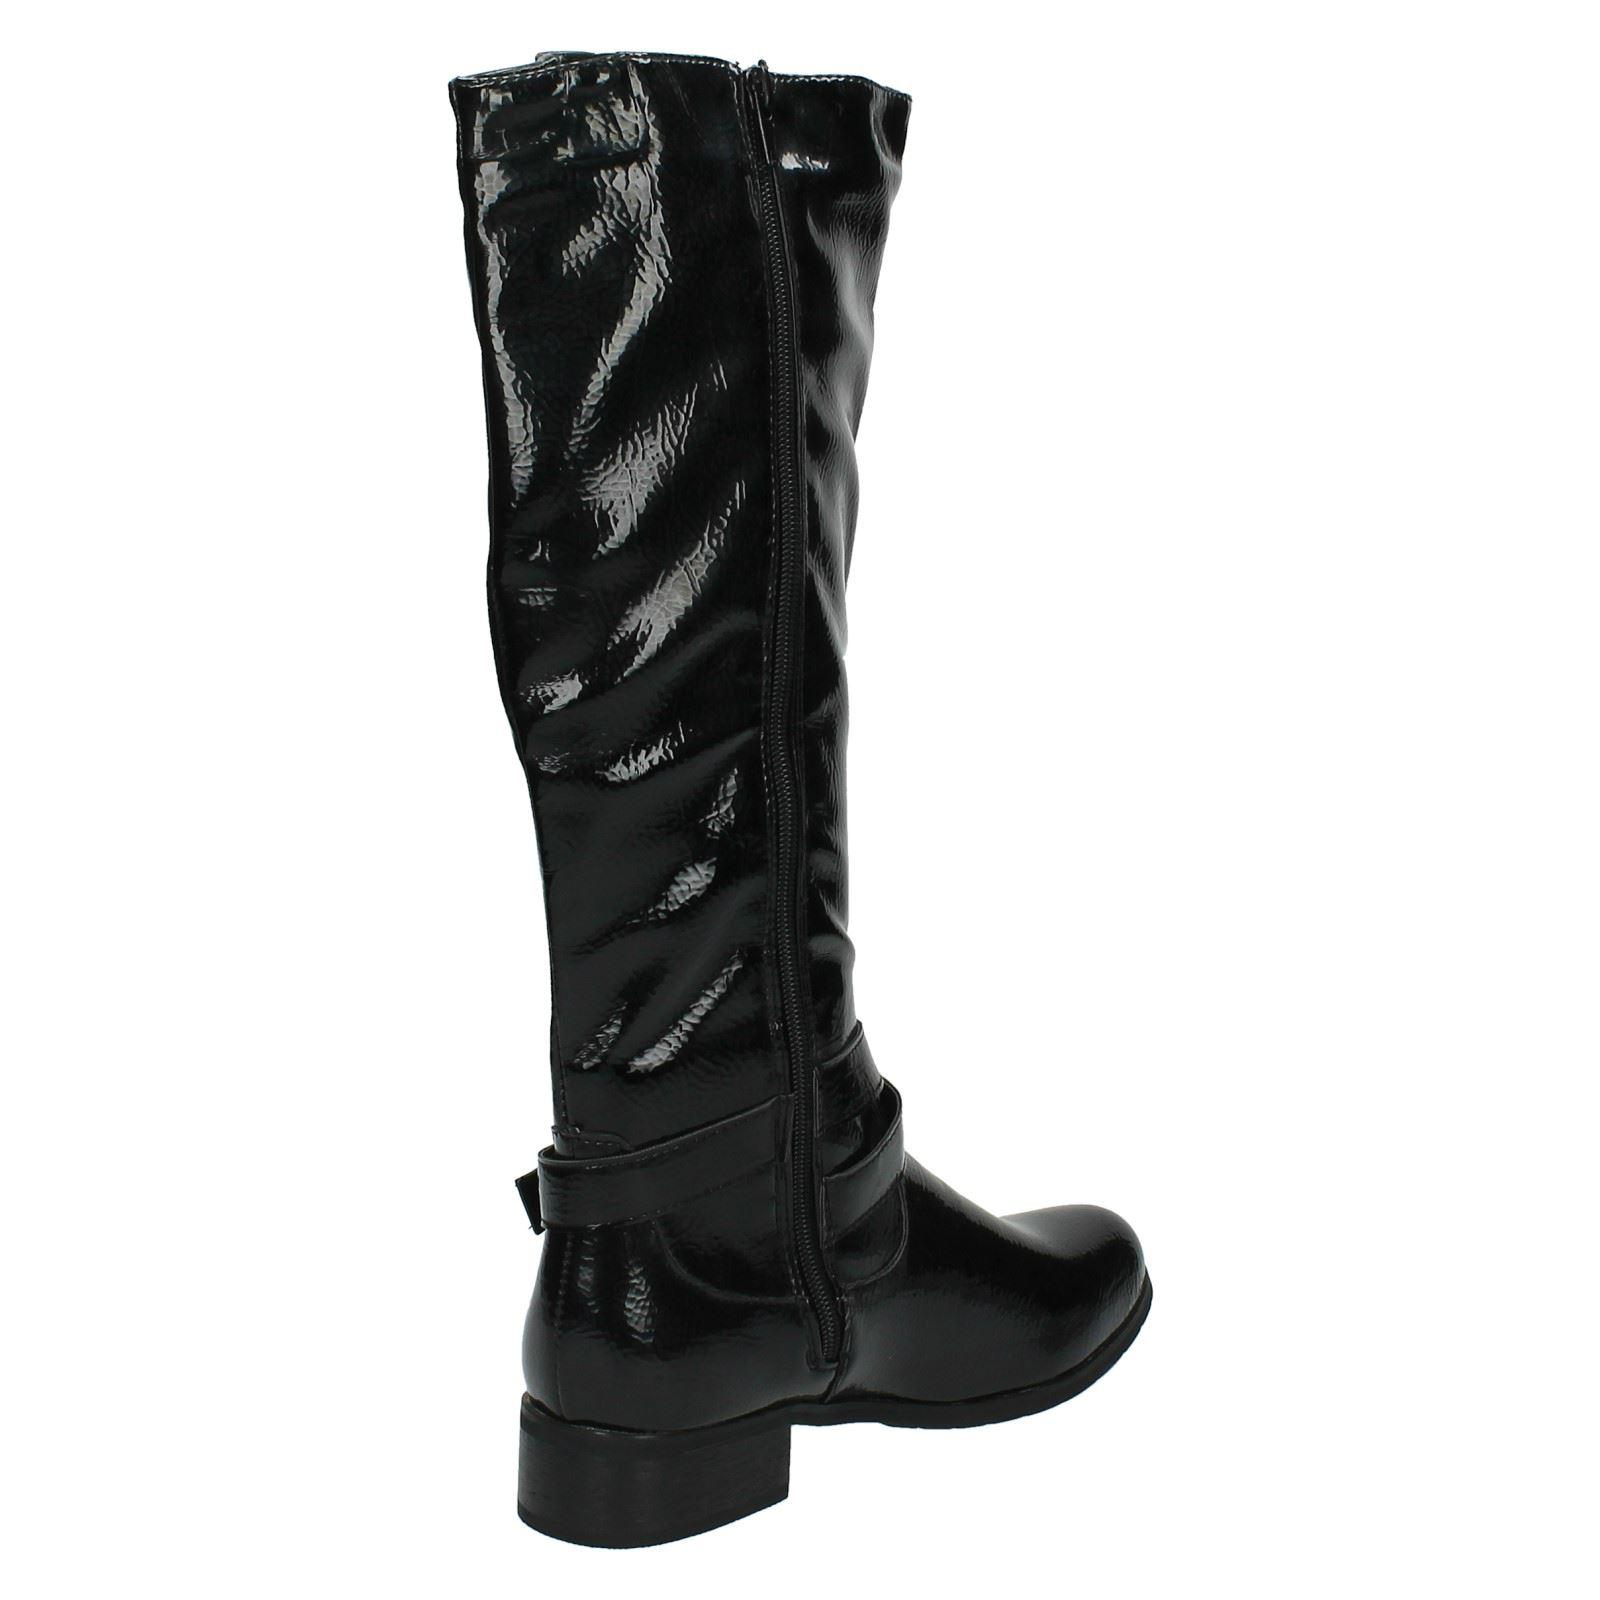 Señoras Spot a montar boot/biker Twist la rodilla, botas